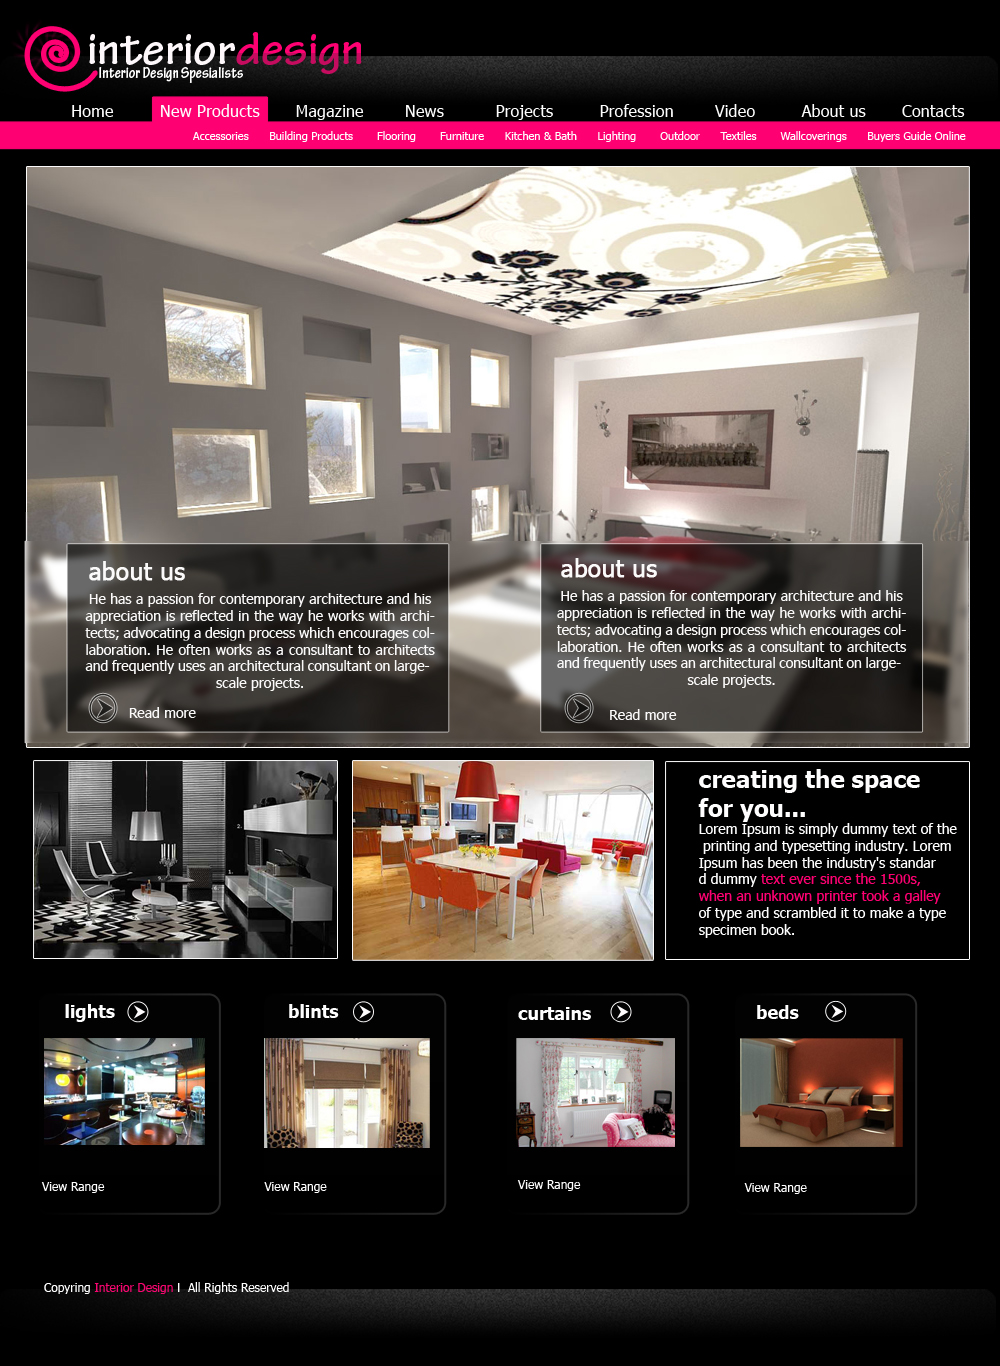 Interior Design Web Template By Viktorian On Deviantart